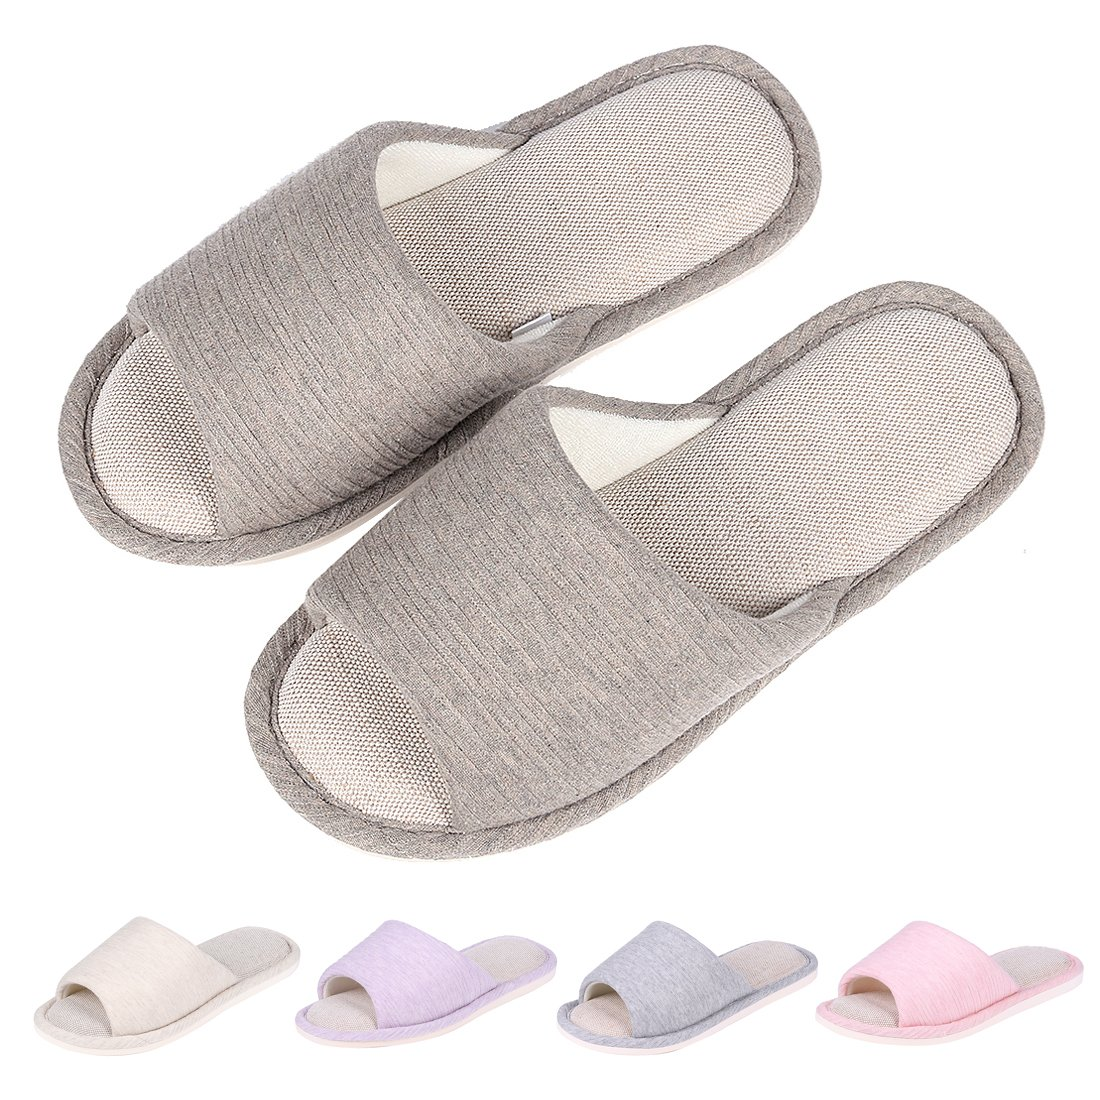 Women's Memory Foam House Slippers Summer Linen Home Shoes Open Toe Slip on Cotton House Slippers DG-XL